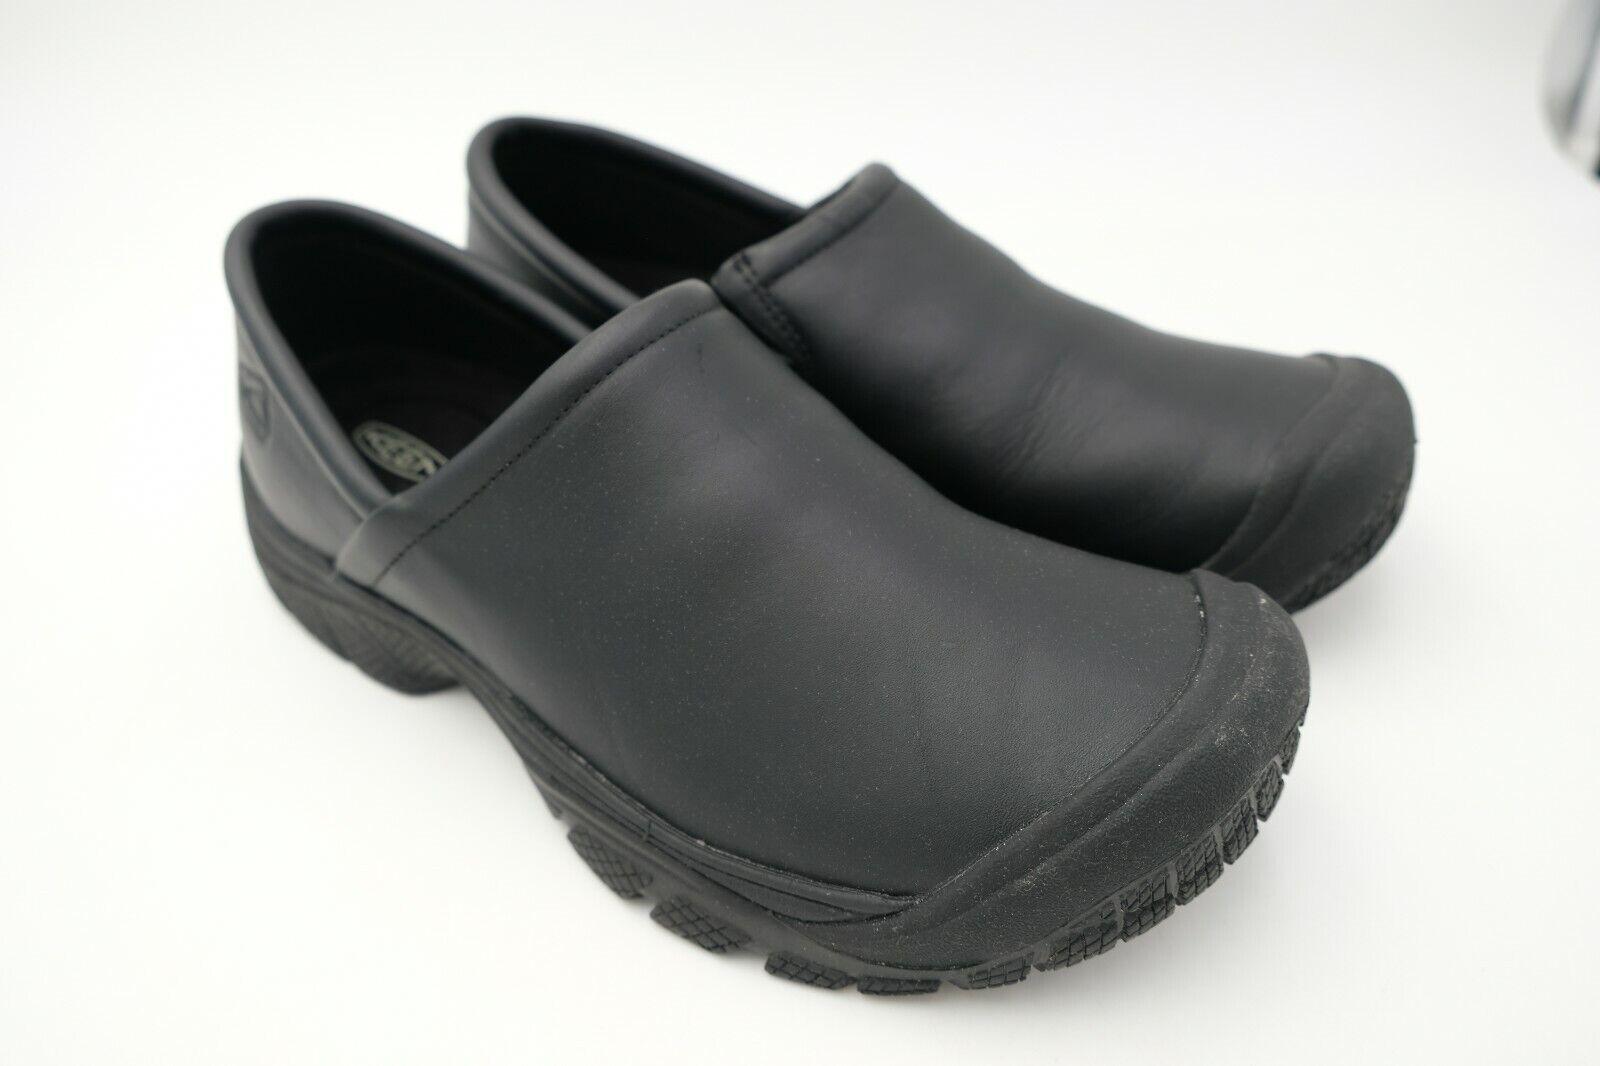 Keen Men's Utility PTC SLIP ON II Black Size US 11 EU 44.5 Used